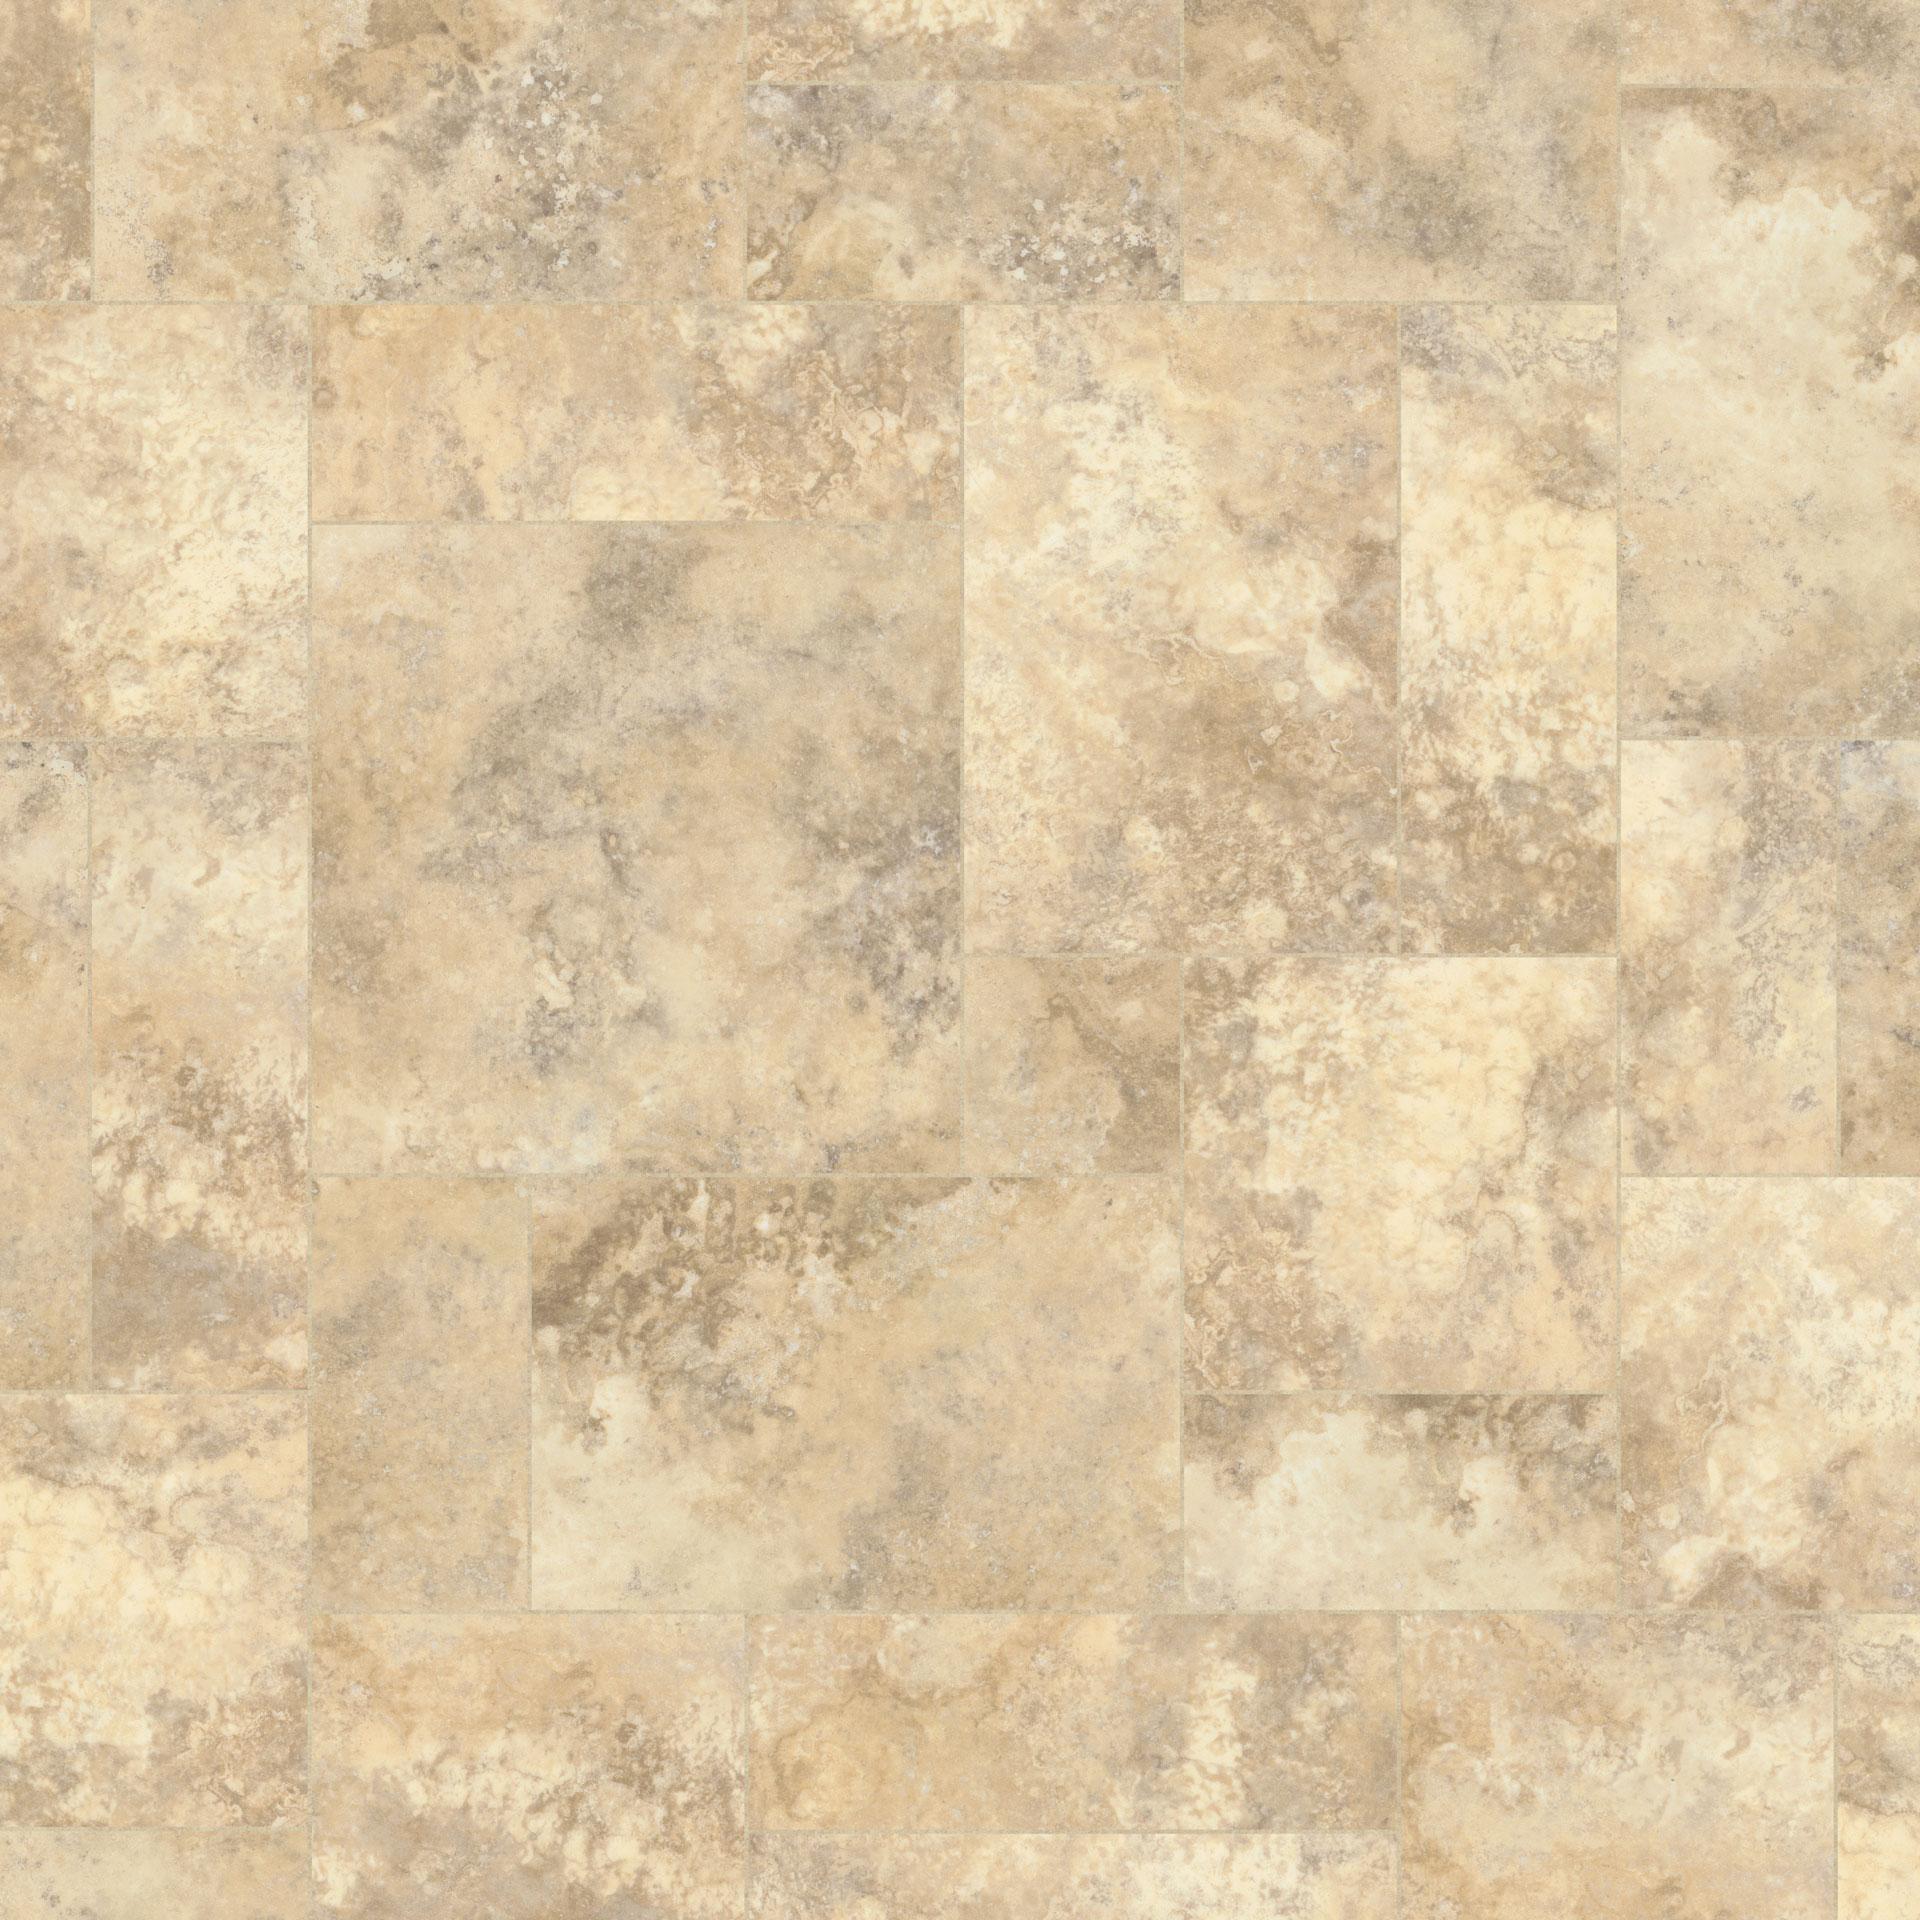 Karndean Art Select Jersey Lm01 Vinyl Flooring